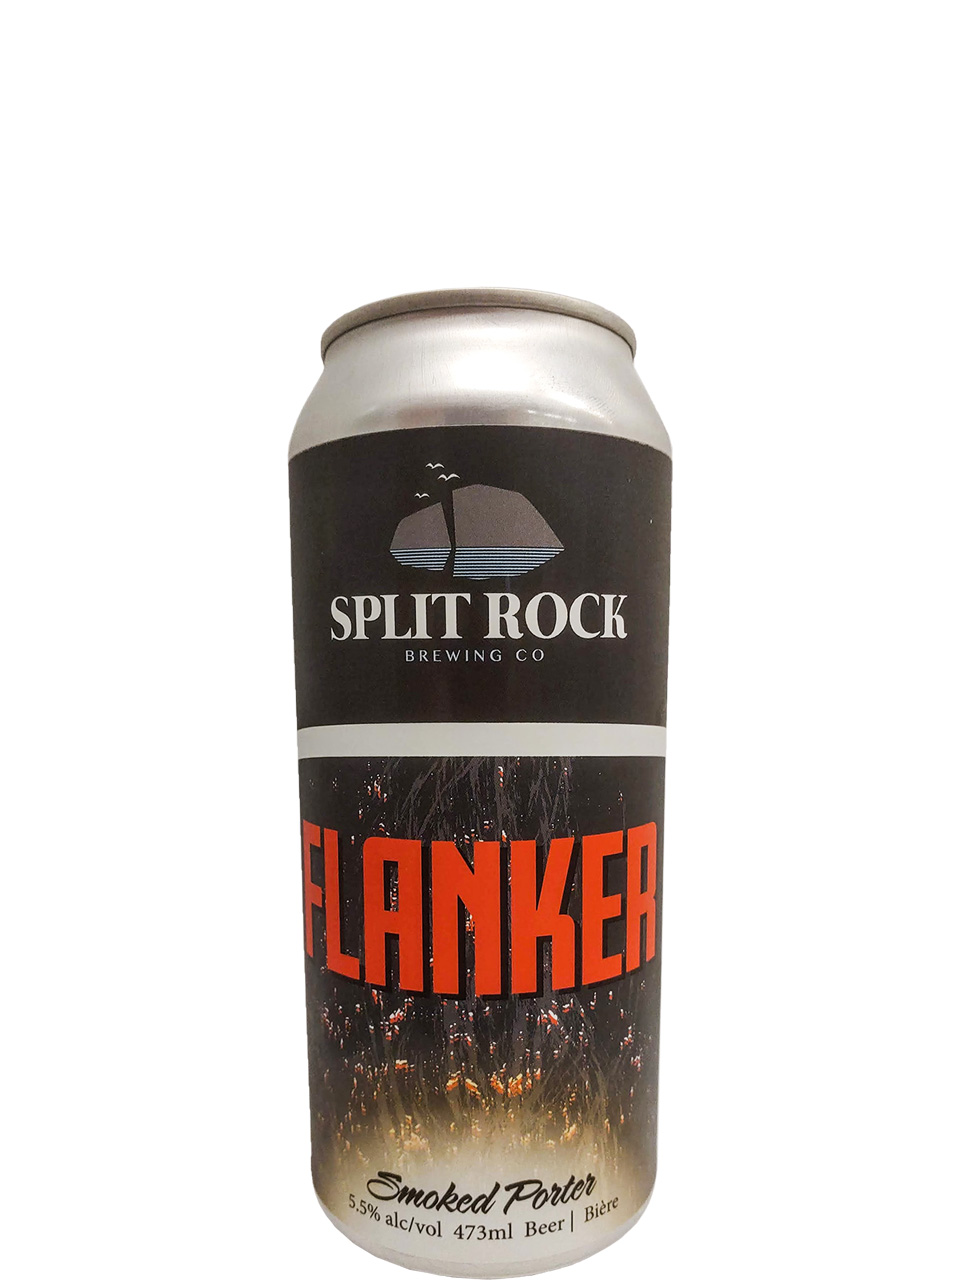 Split Rock Flanker Smoked Porter 473ml Can